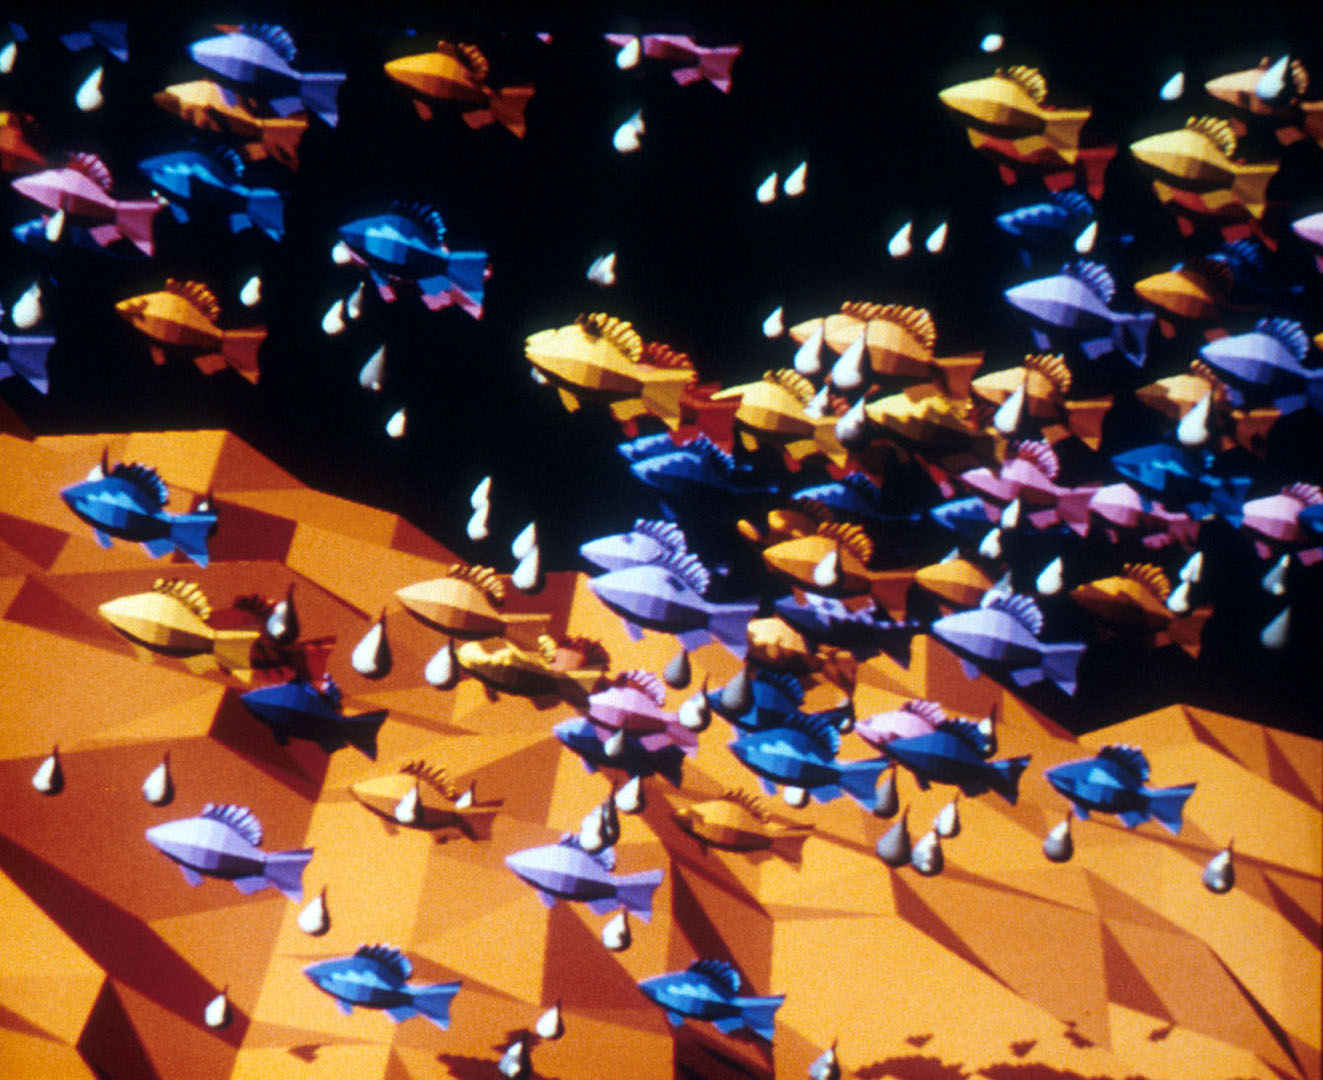 ©1985, Vibeke Sorensen, Microfishe